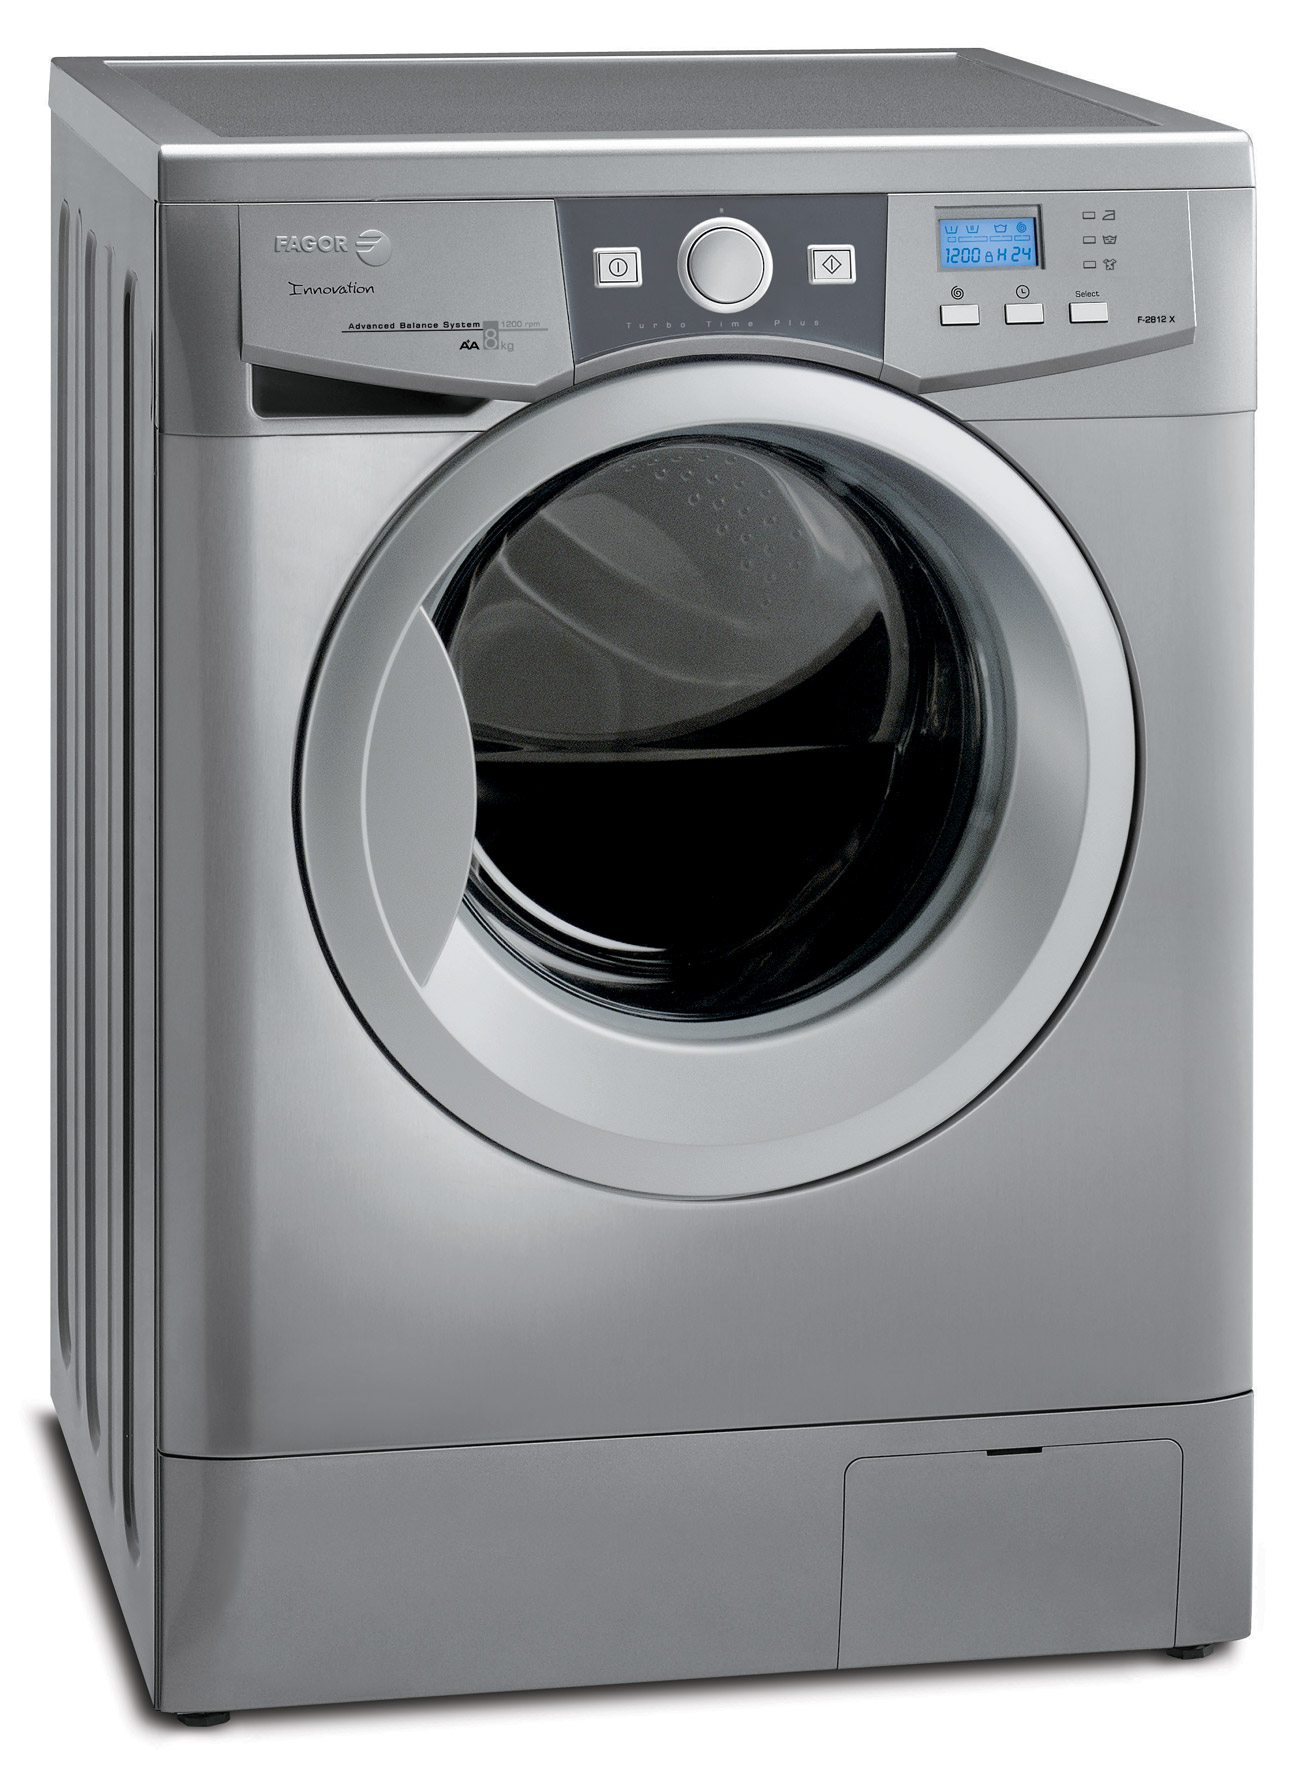 Lavadora fagor blog de reparaci n for Cuanto pesa lavadora